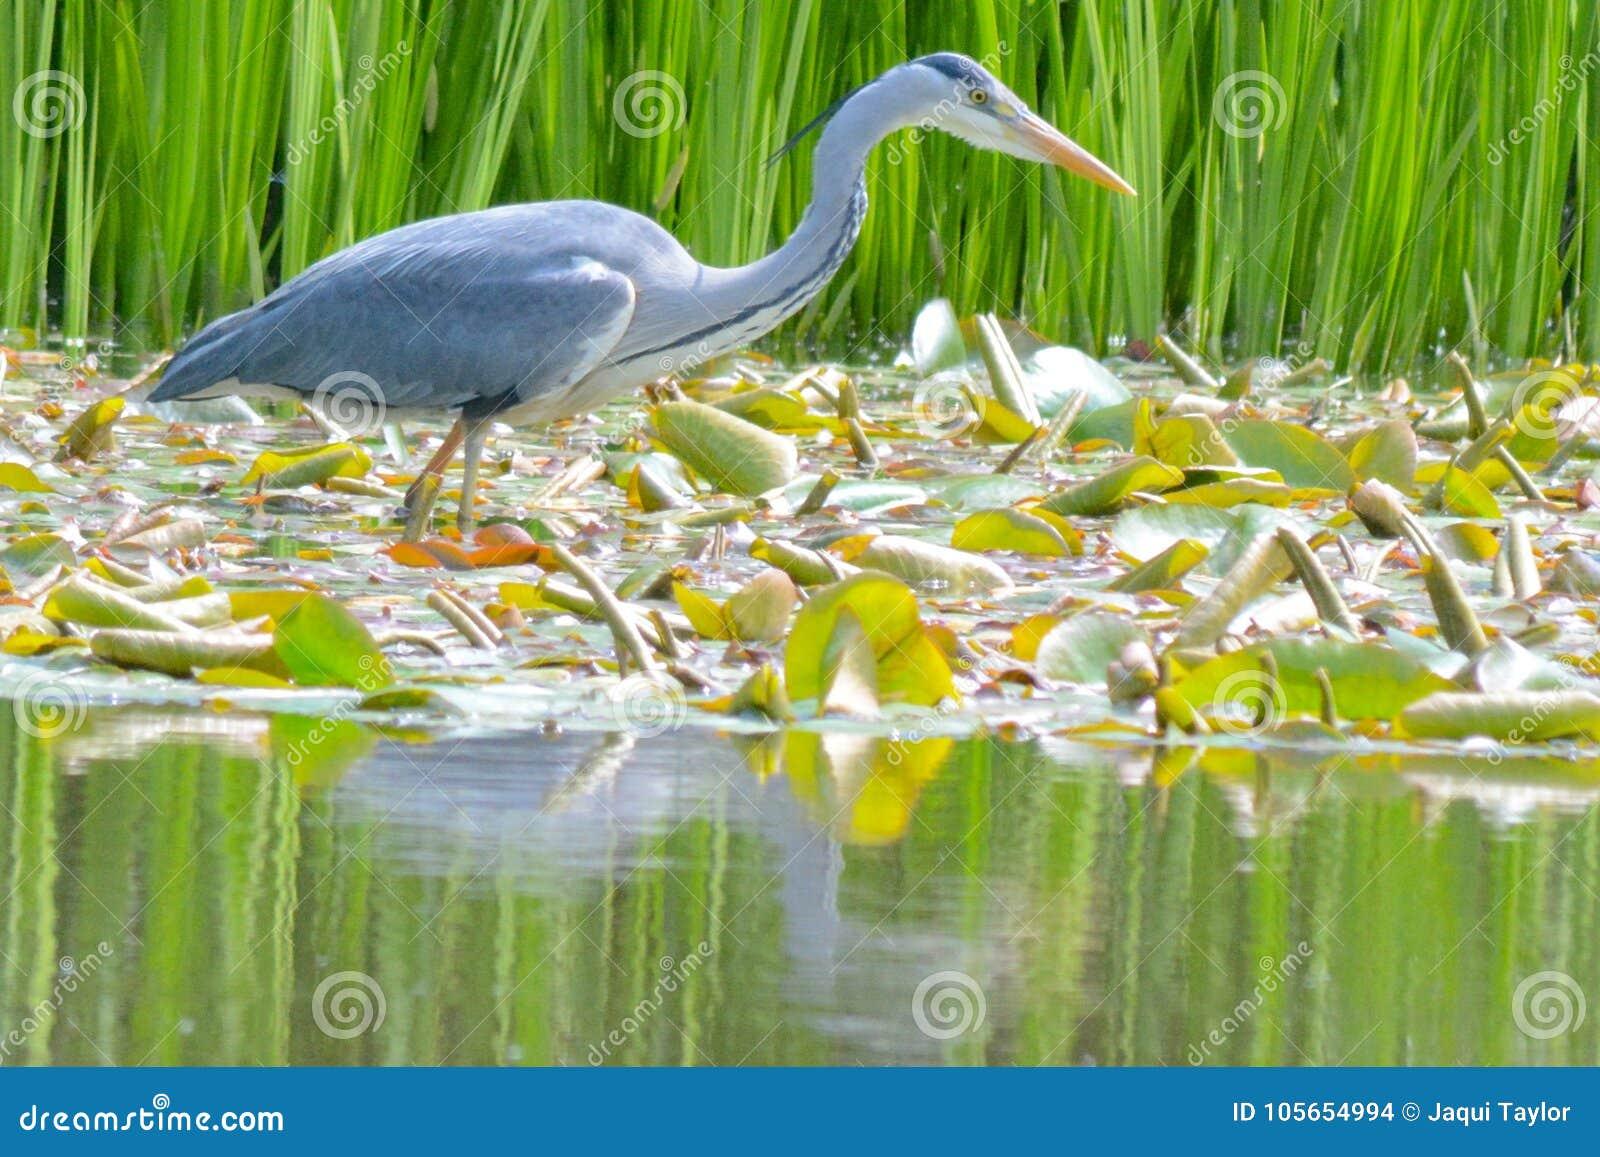 A heron fishing on the Ornamental Pond, Southampton Common